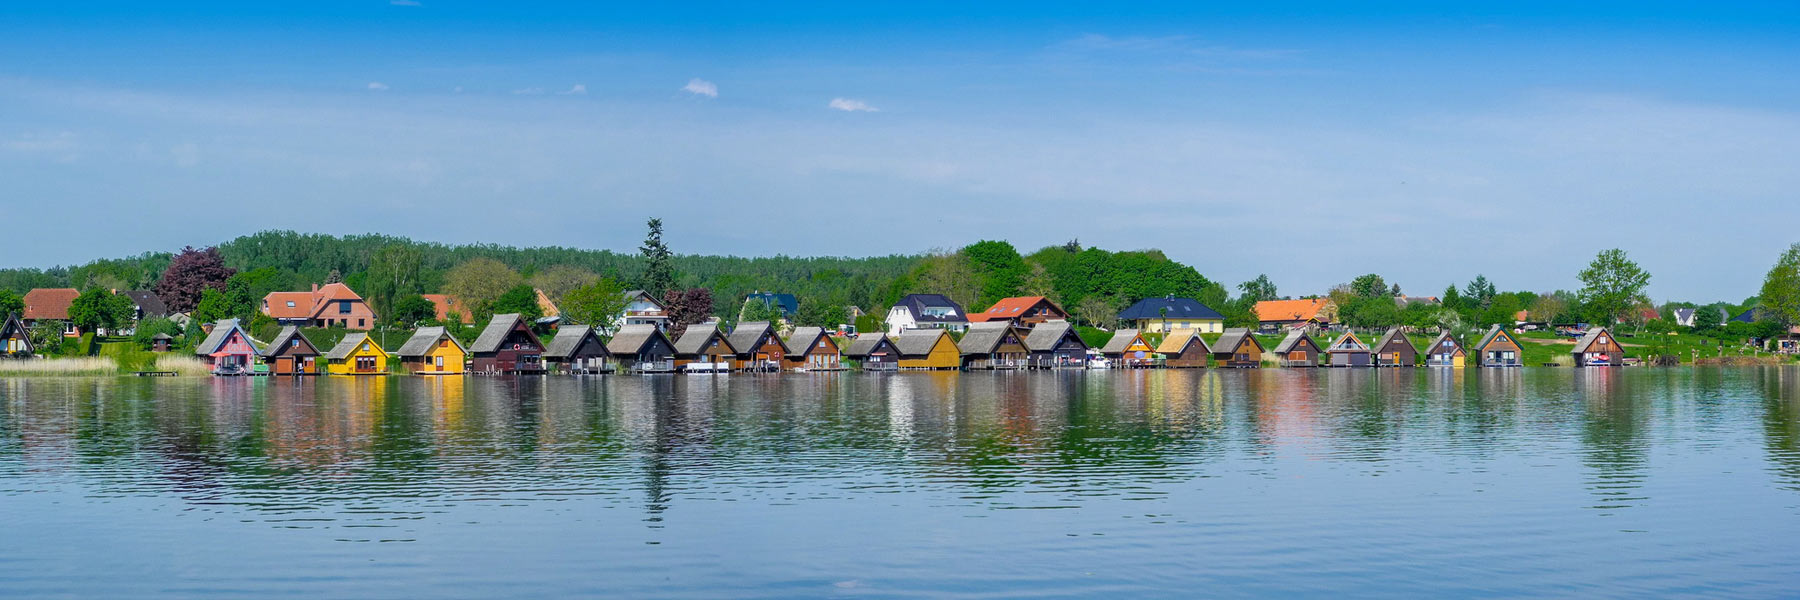 Bootshäuser - Mirow